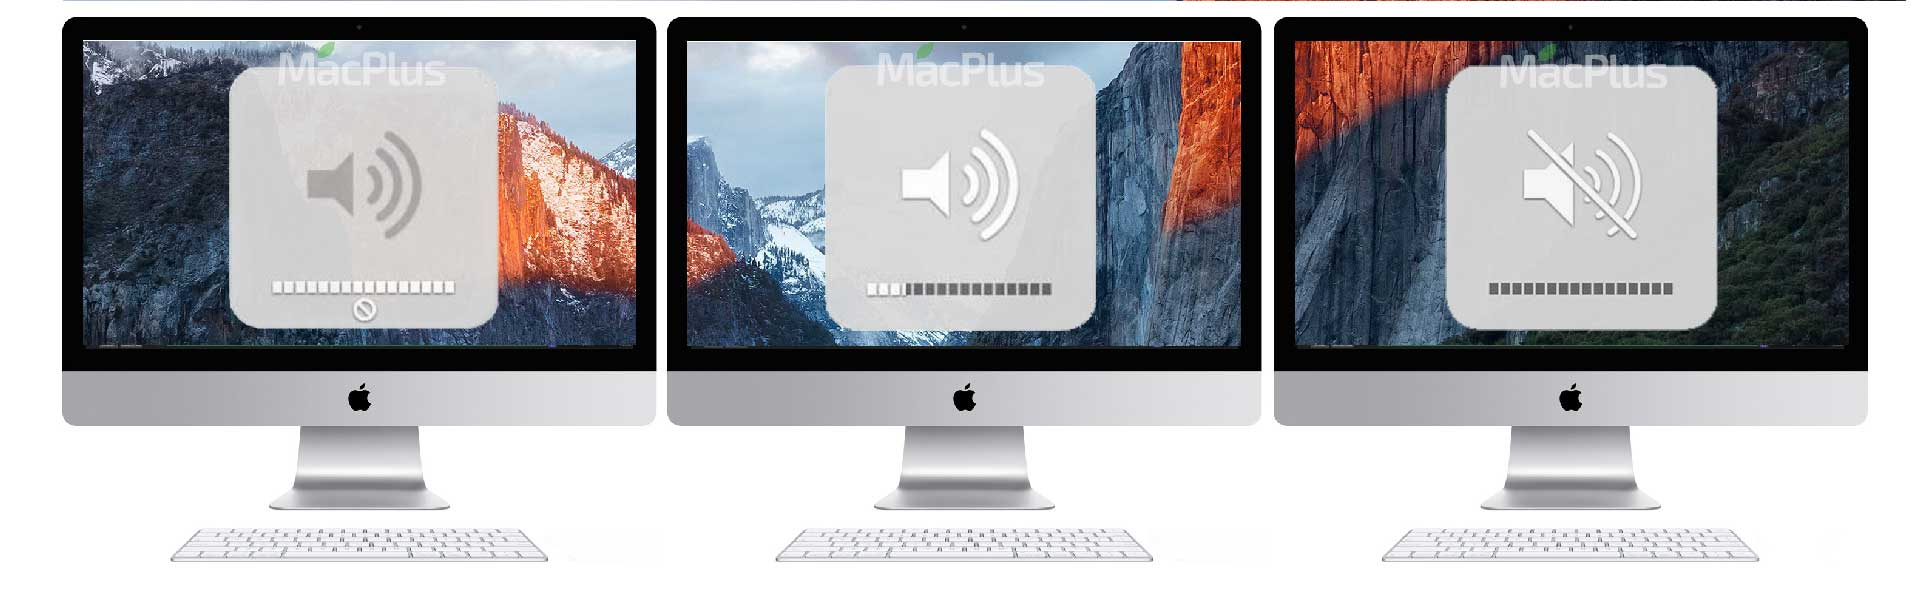 На iMac пропал звук, Нет звука на iMac, Звук iMac тихий